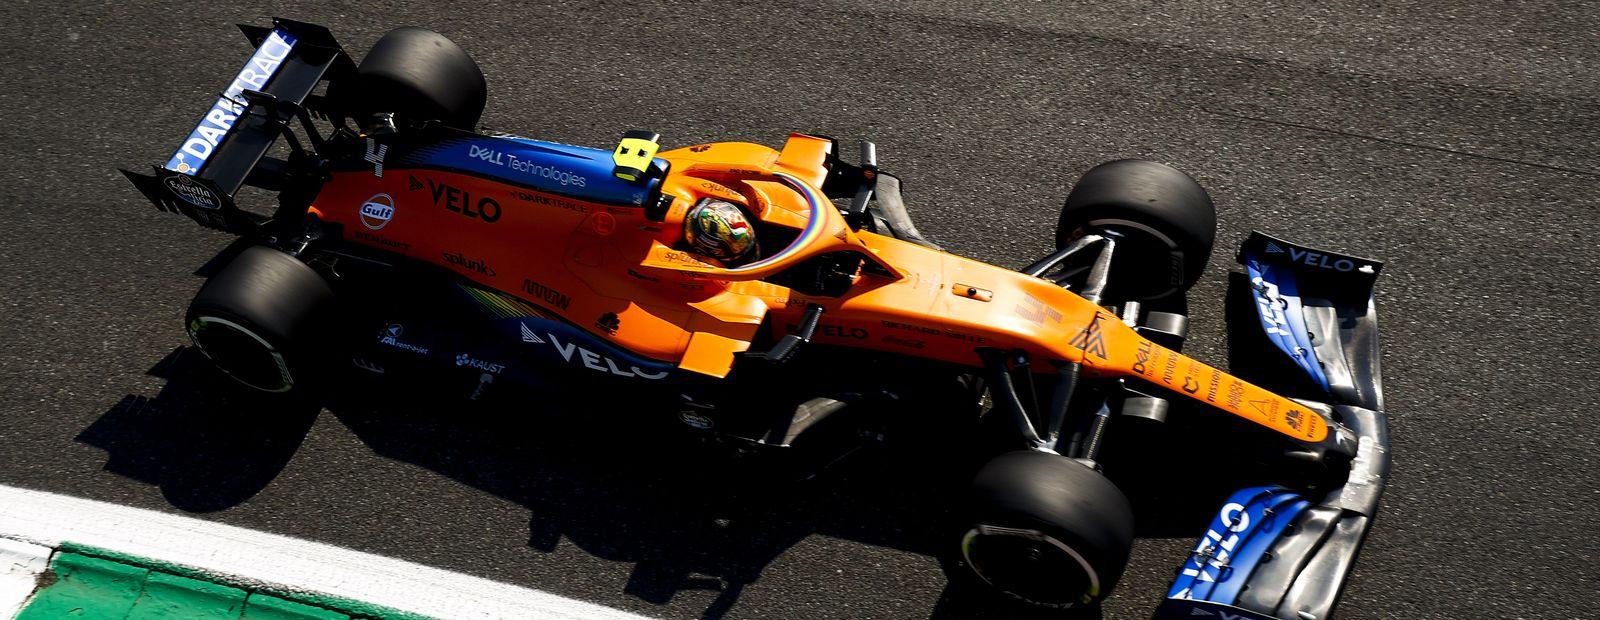 2020 Italian Grand Prix – Free Practice